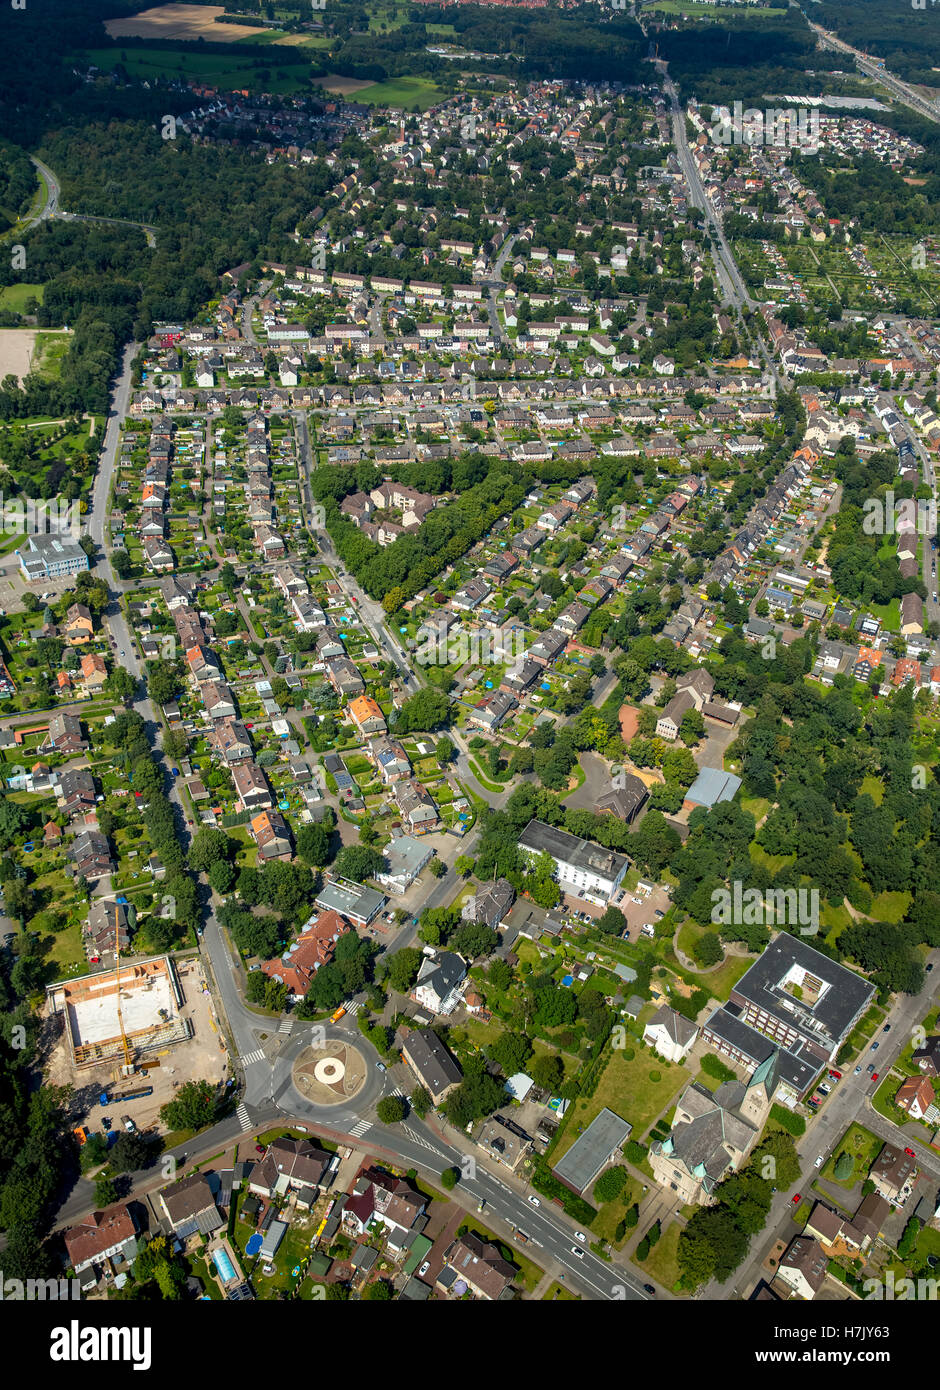 Aerial view, Recklinghausen triangle development, housing estate for mine Clerget Clara and Zeche Recklinghausen - Stock Image